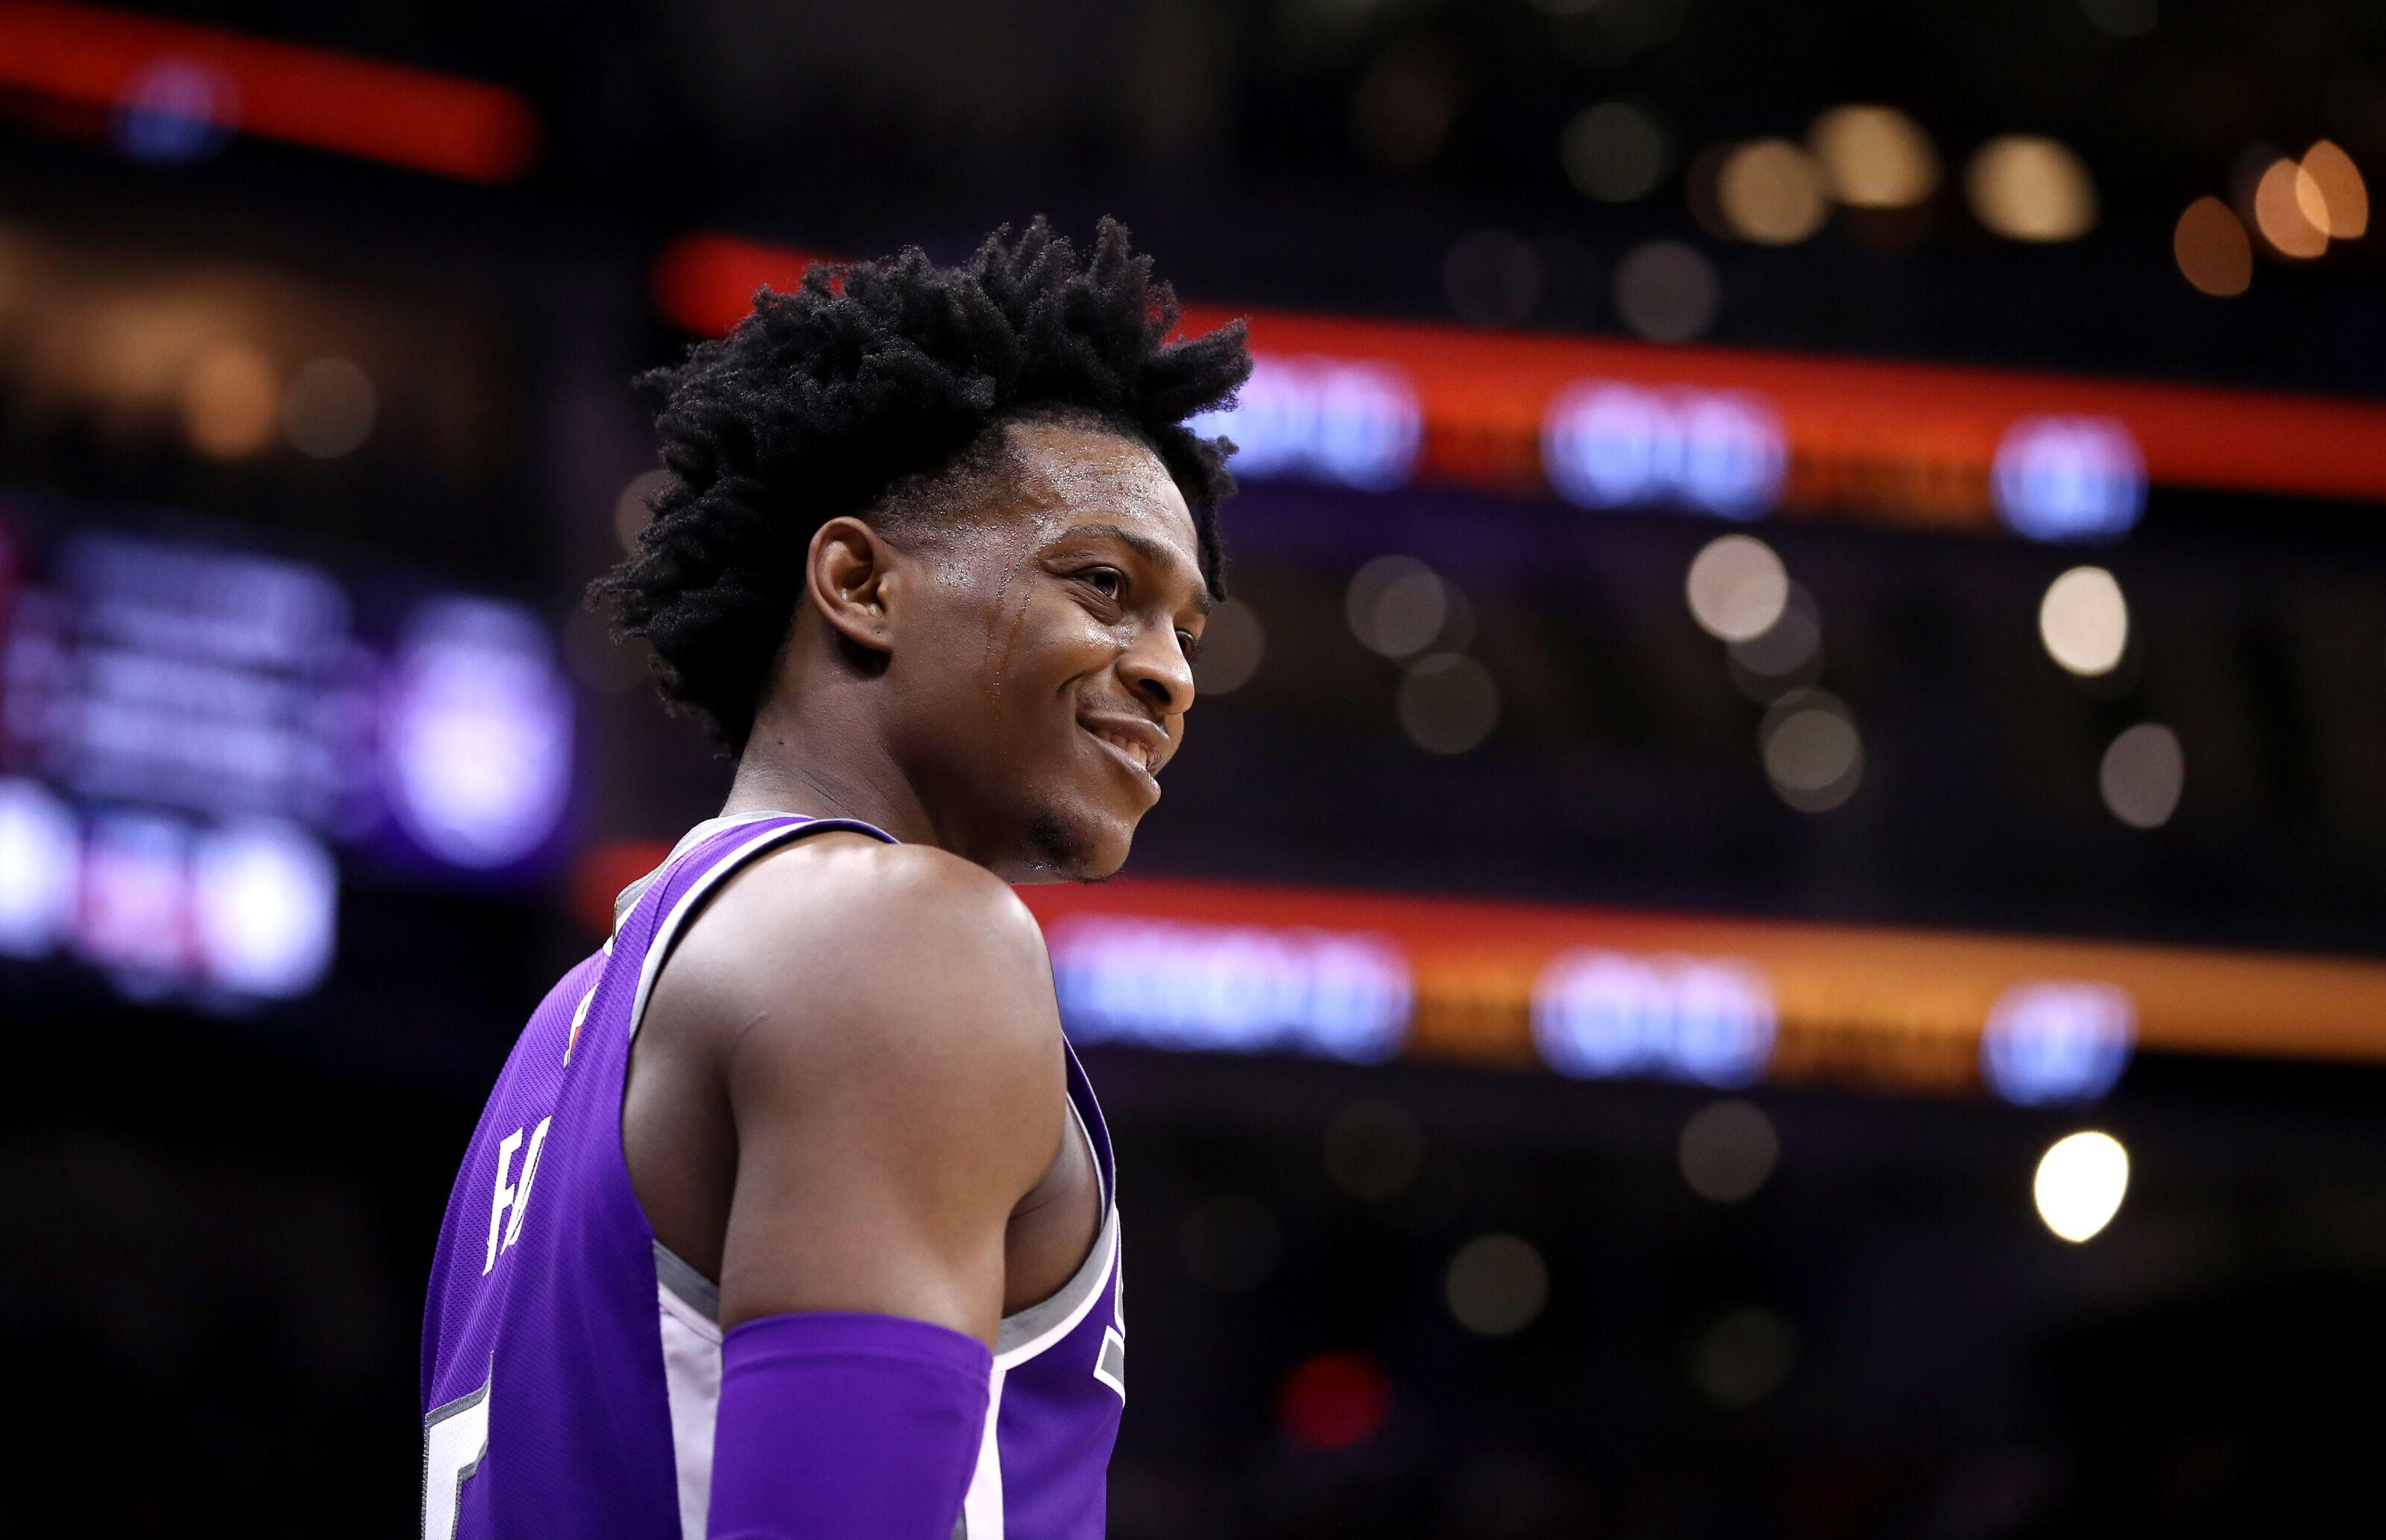 Sacramento Kings: De'Aaron Fox is ready to become an elite point guard